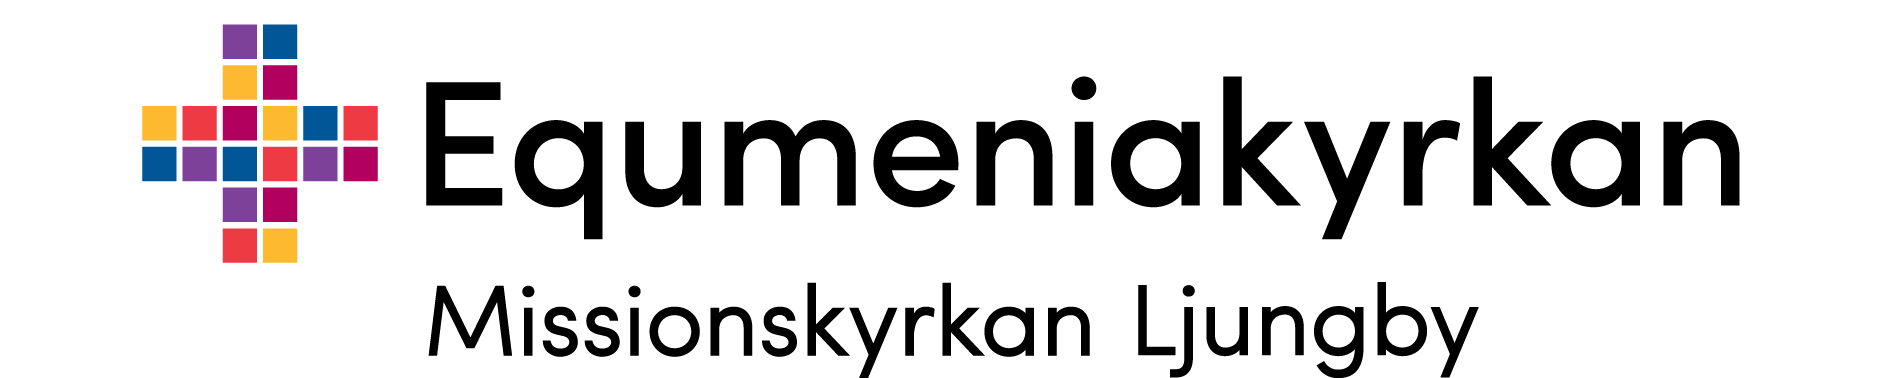 Ljungby Missionskyrka